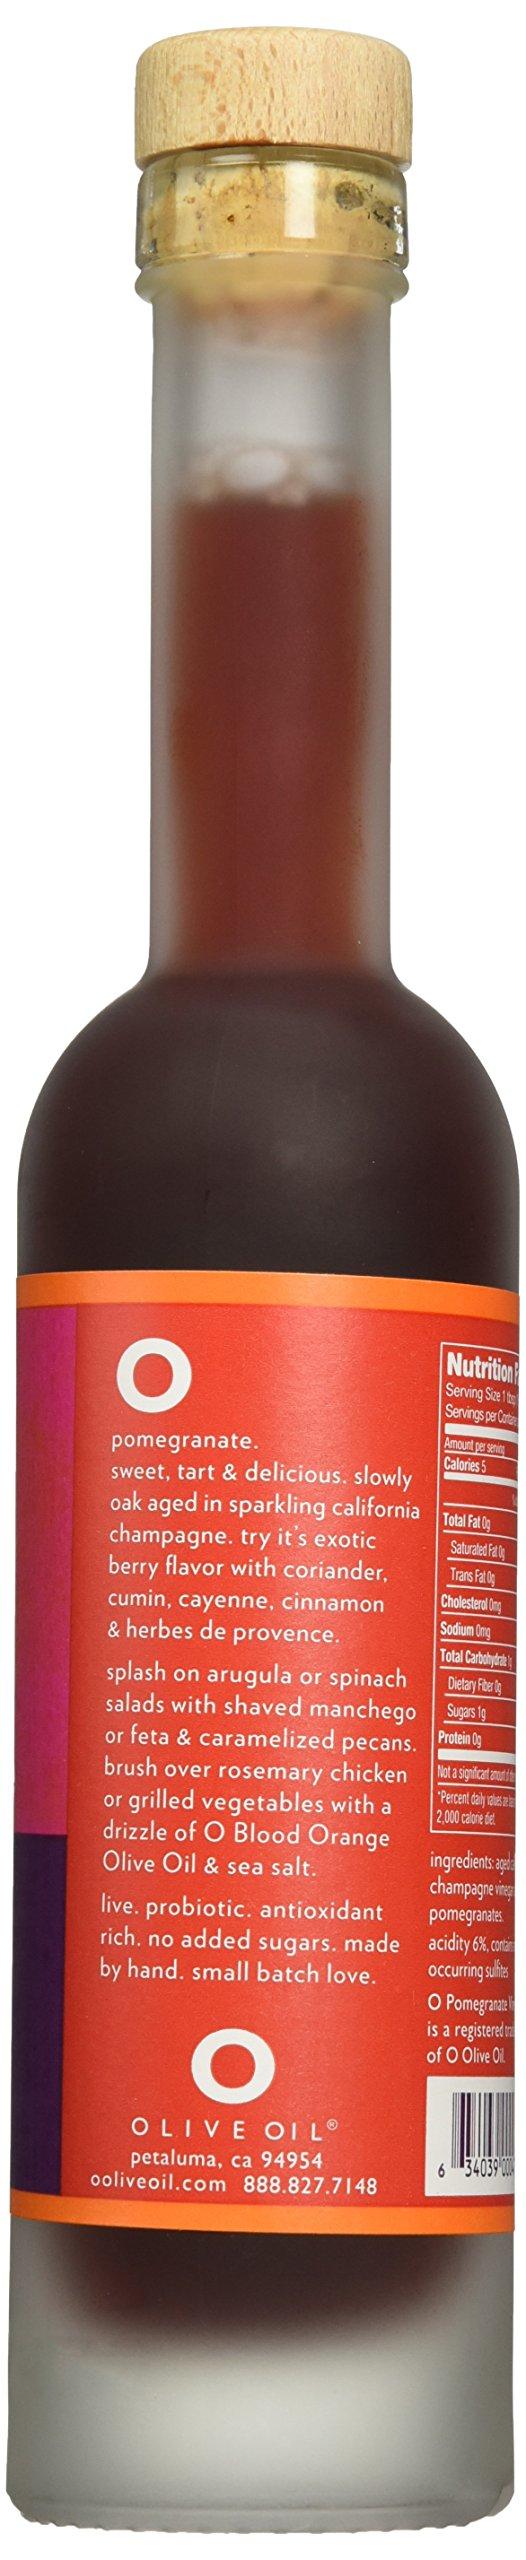 O OLIVE OIL & VINEGAR Pomegranate Champagne Wine Vinegar, 6.8 Fluid Ounce by O OLIVE OIL & VINEGAR (Image #5)